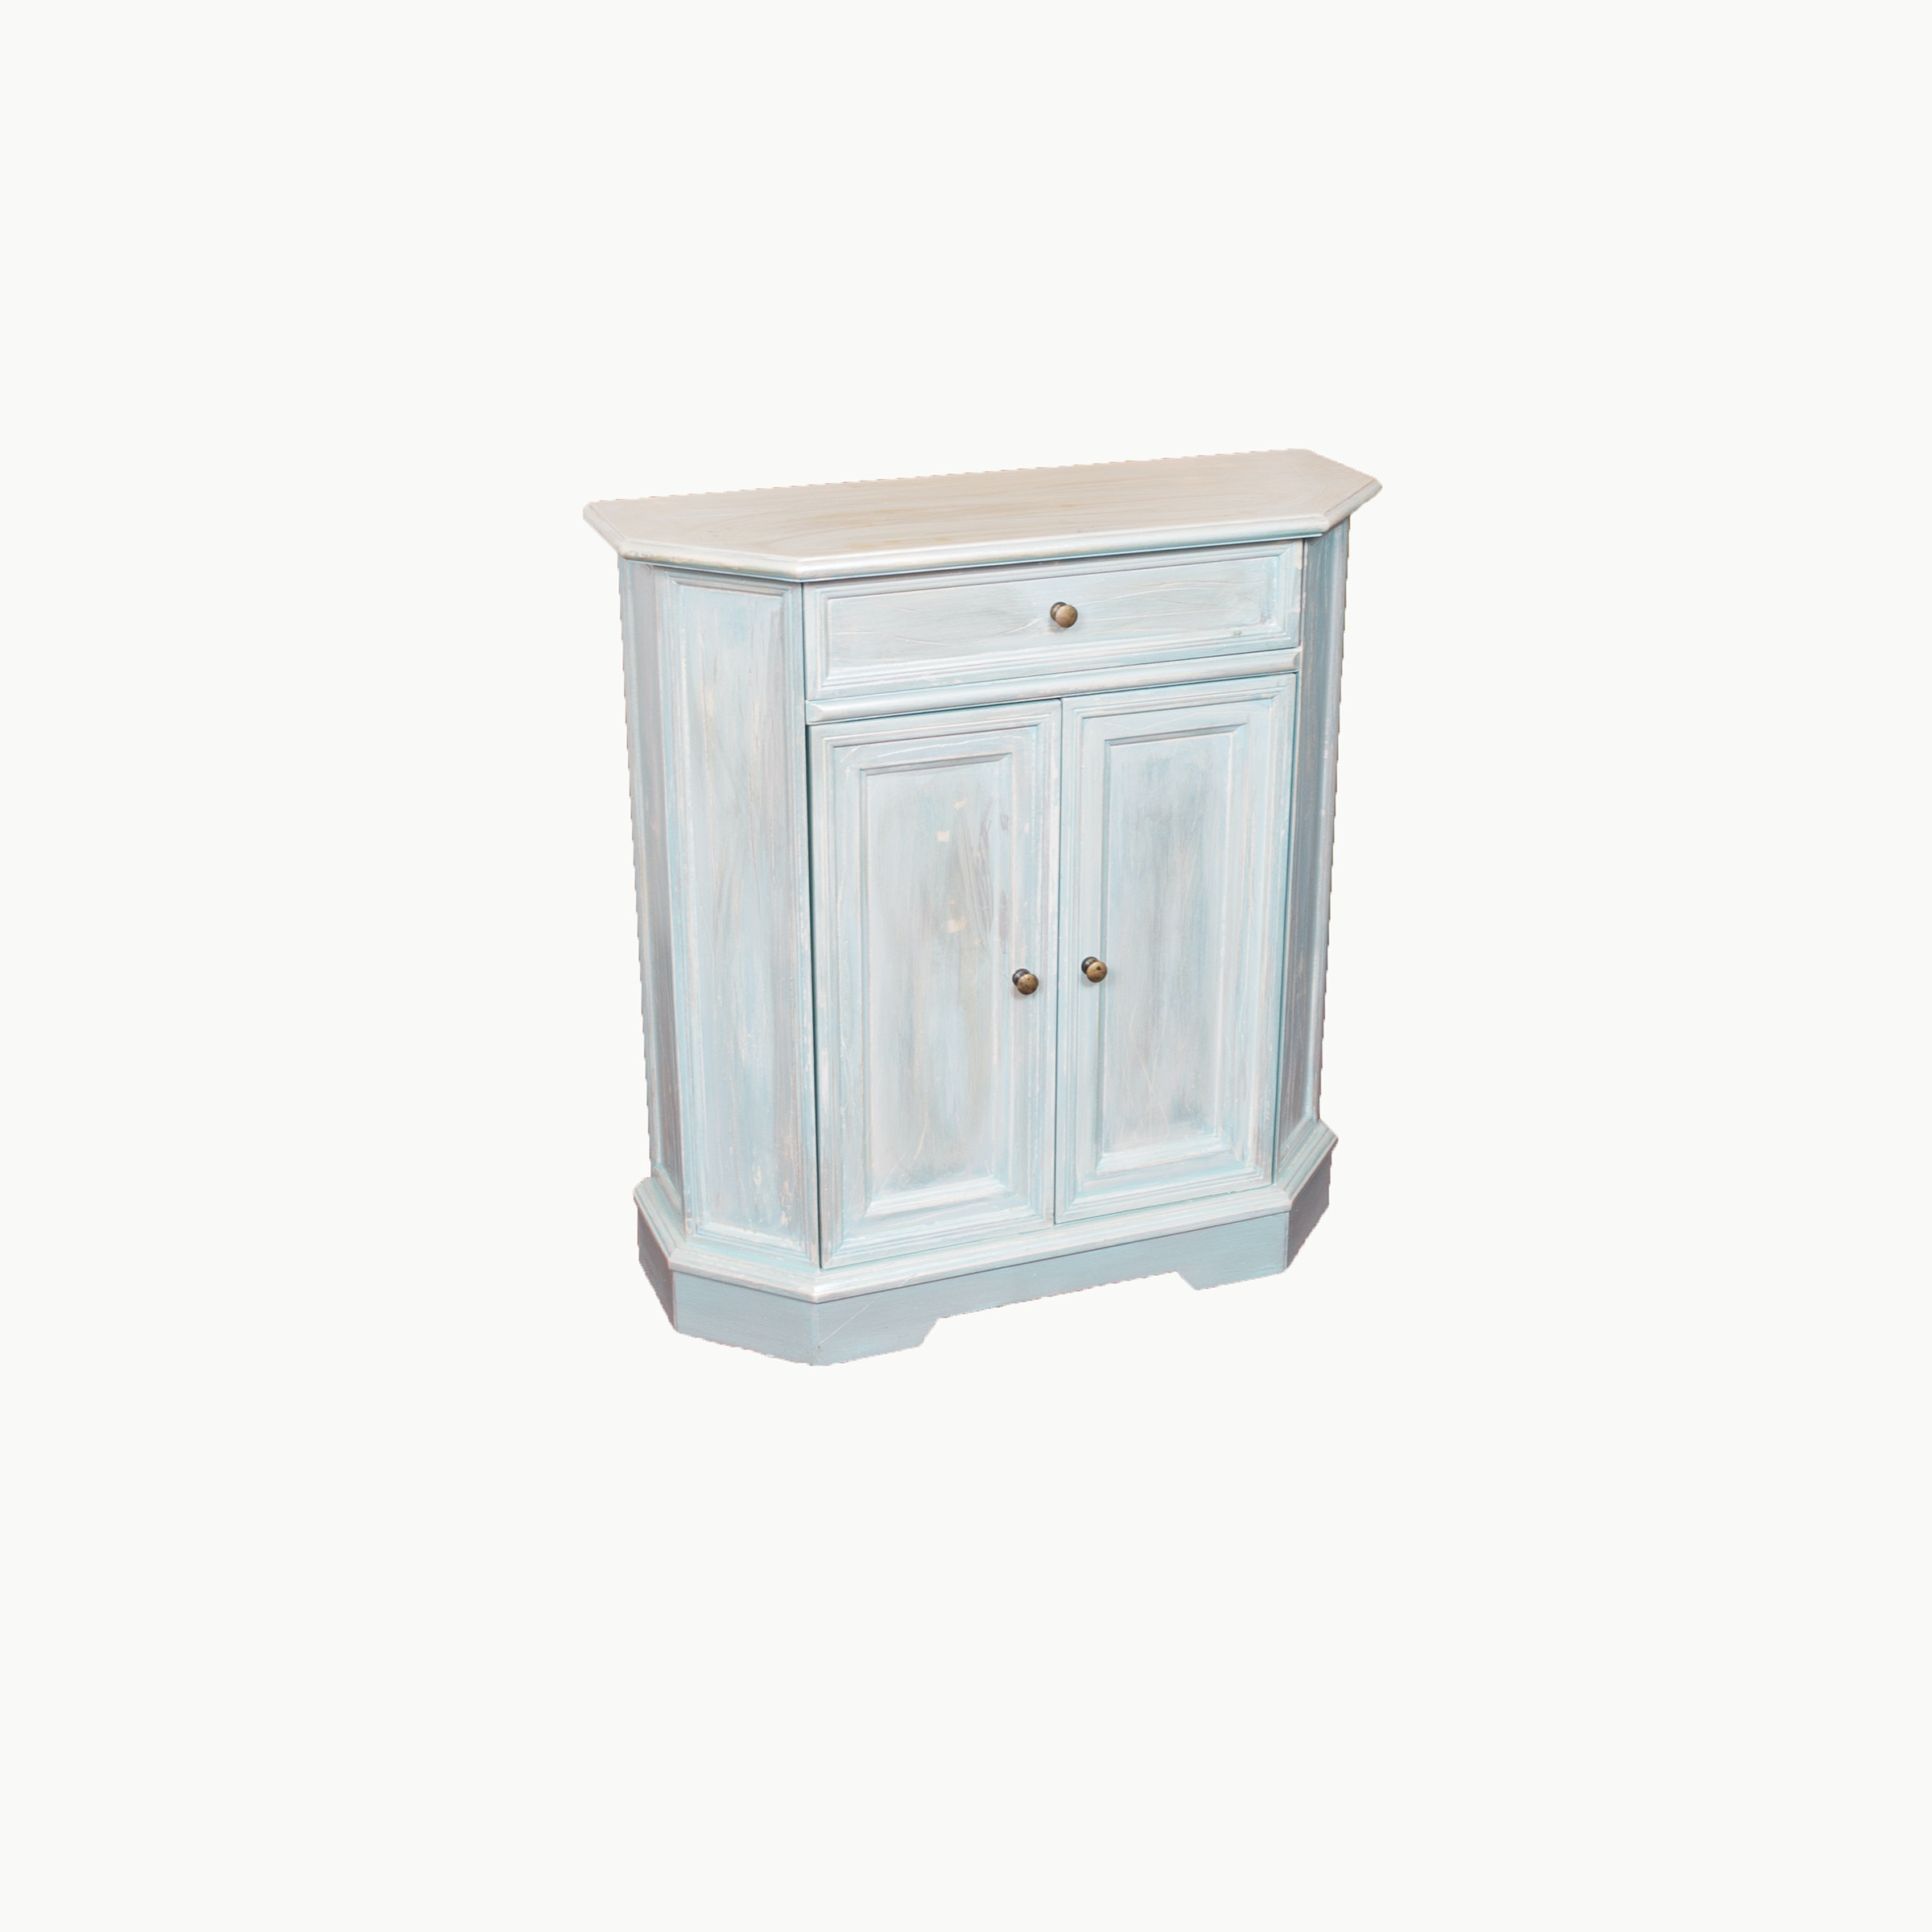 Painted Side Cabinet by Ballard Designs